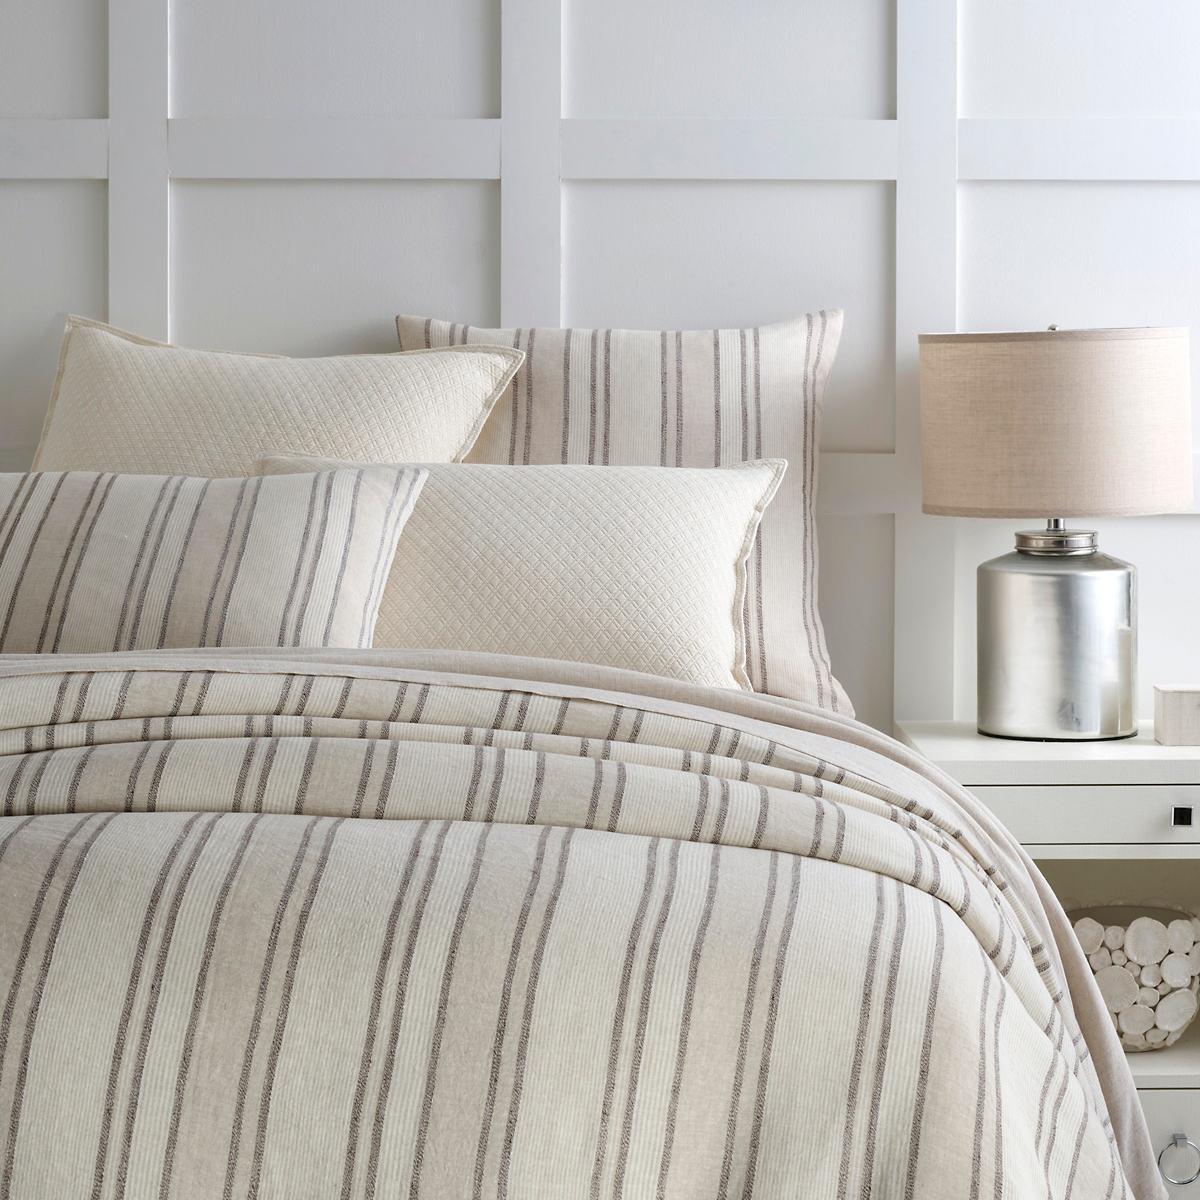 Hampton Ticking Linen Natural Duvet Cover